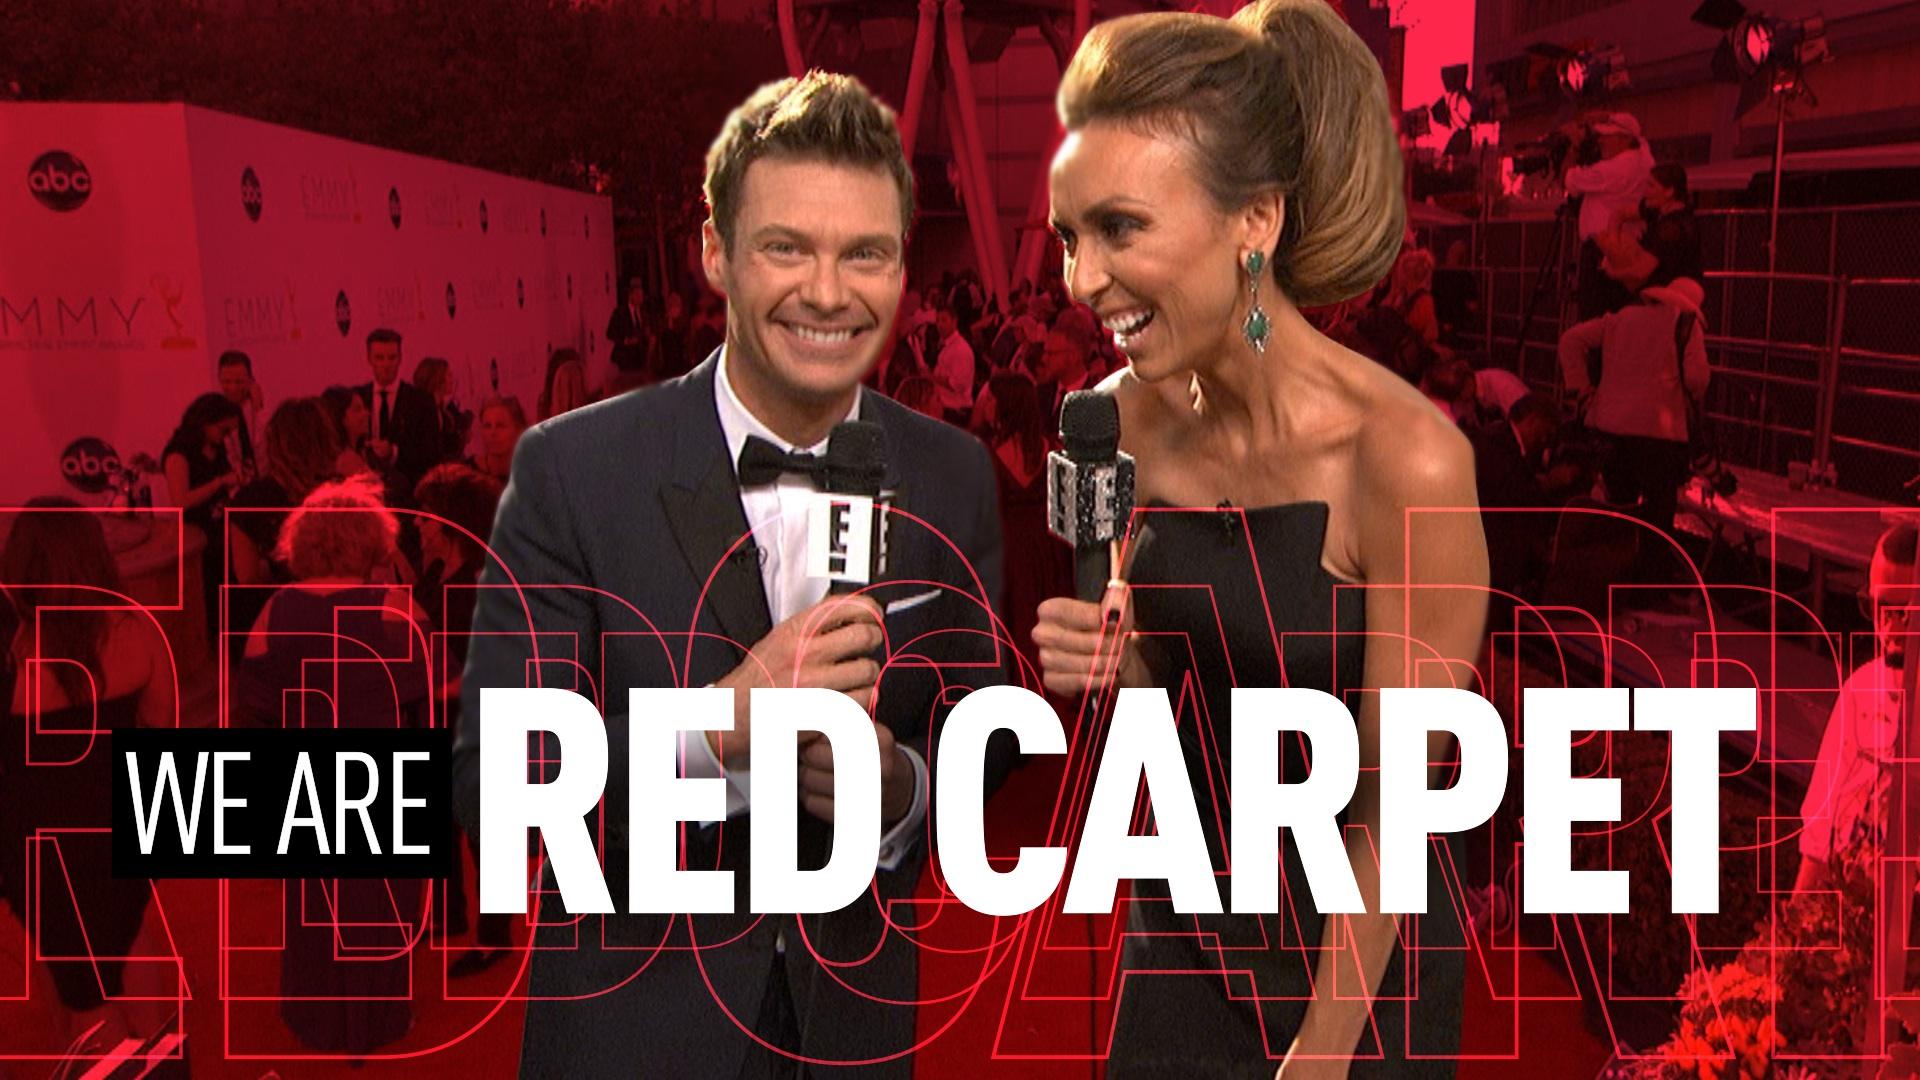 tv promo motion graphics   We Are Red Carpet   jonberrydesign